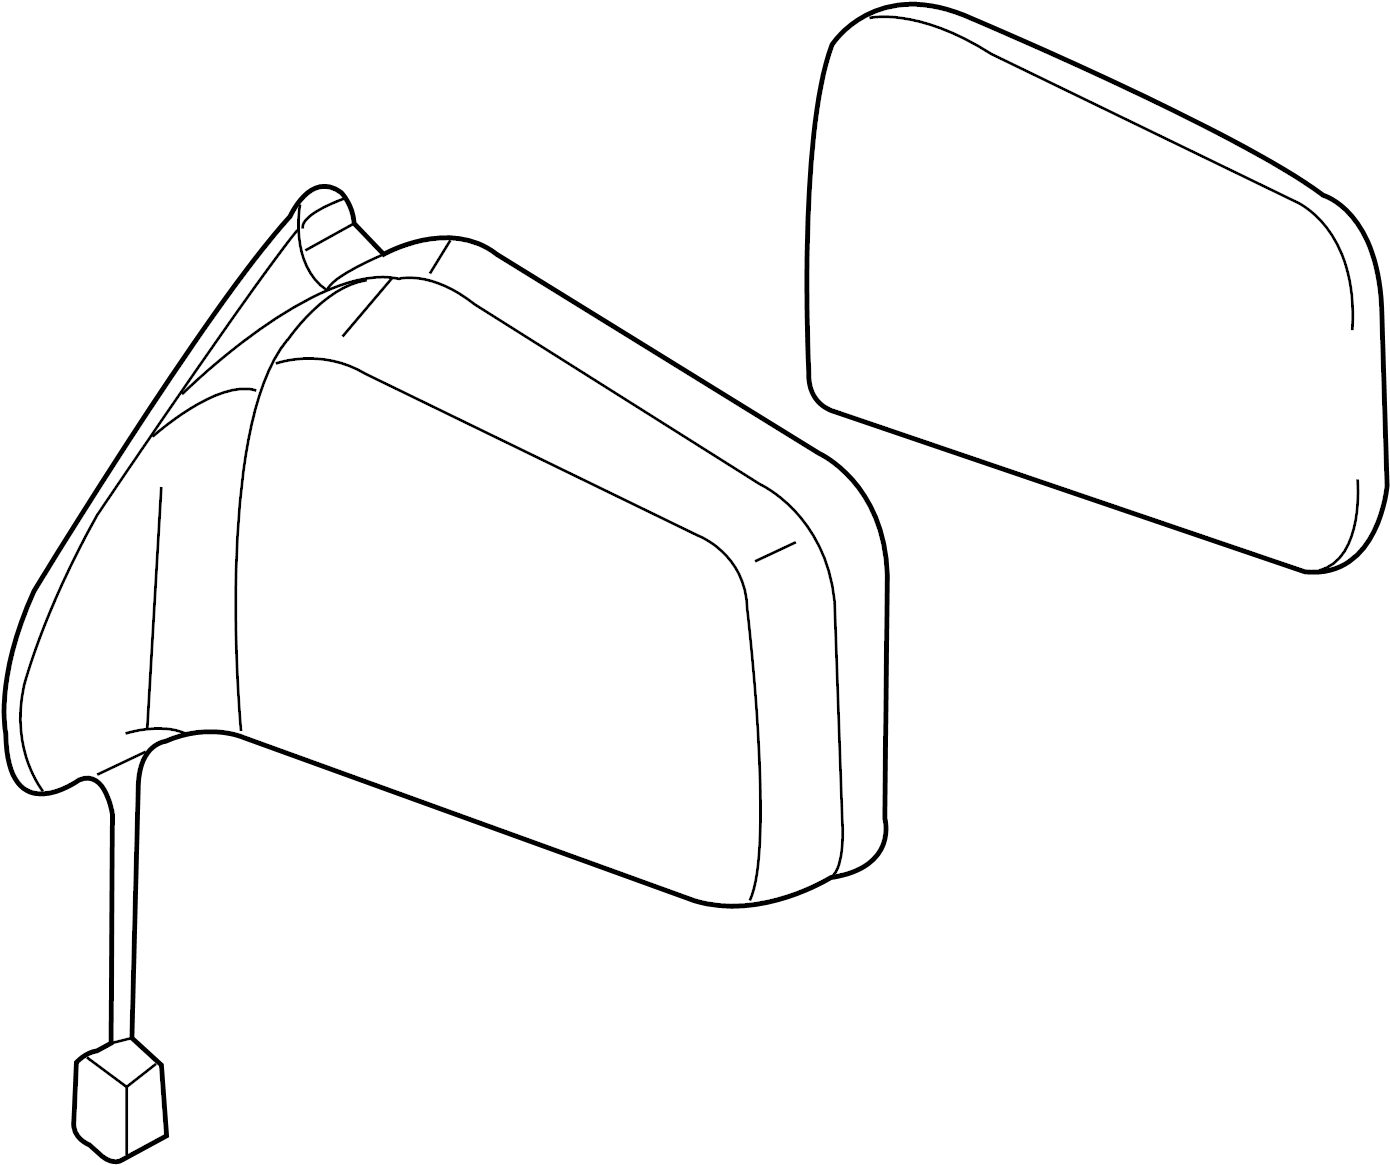 Nissan Xterra Door Mirror (Right). MANUAL, FOLDING, BODY